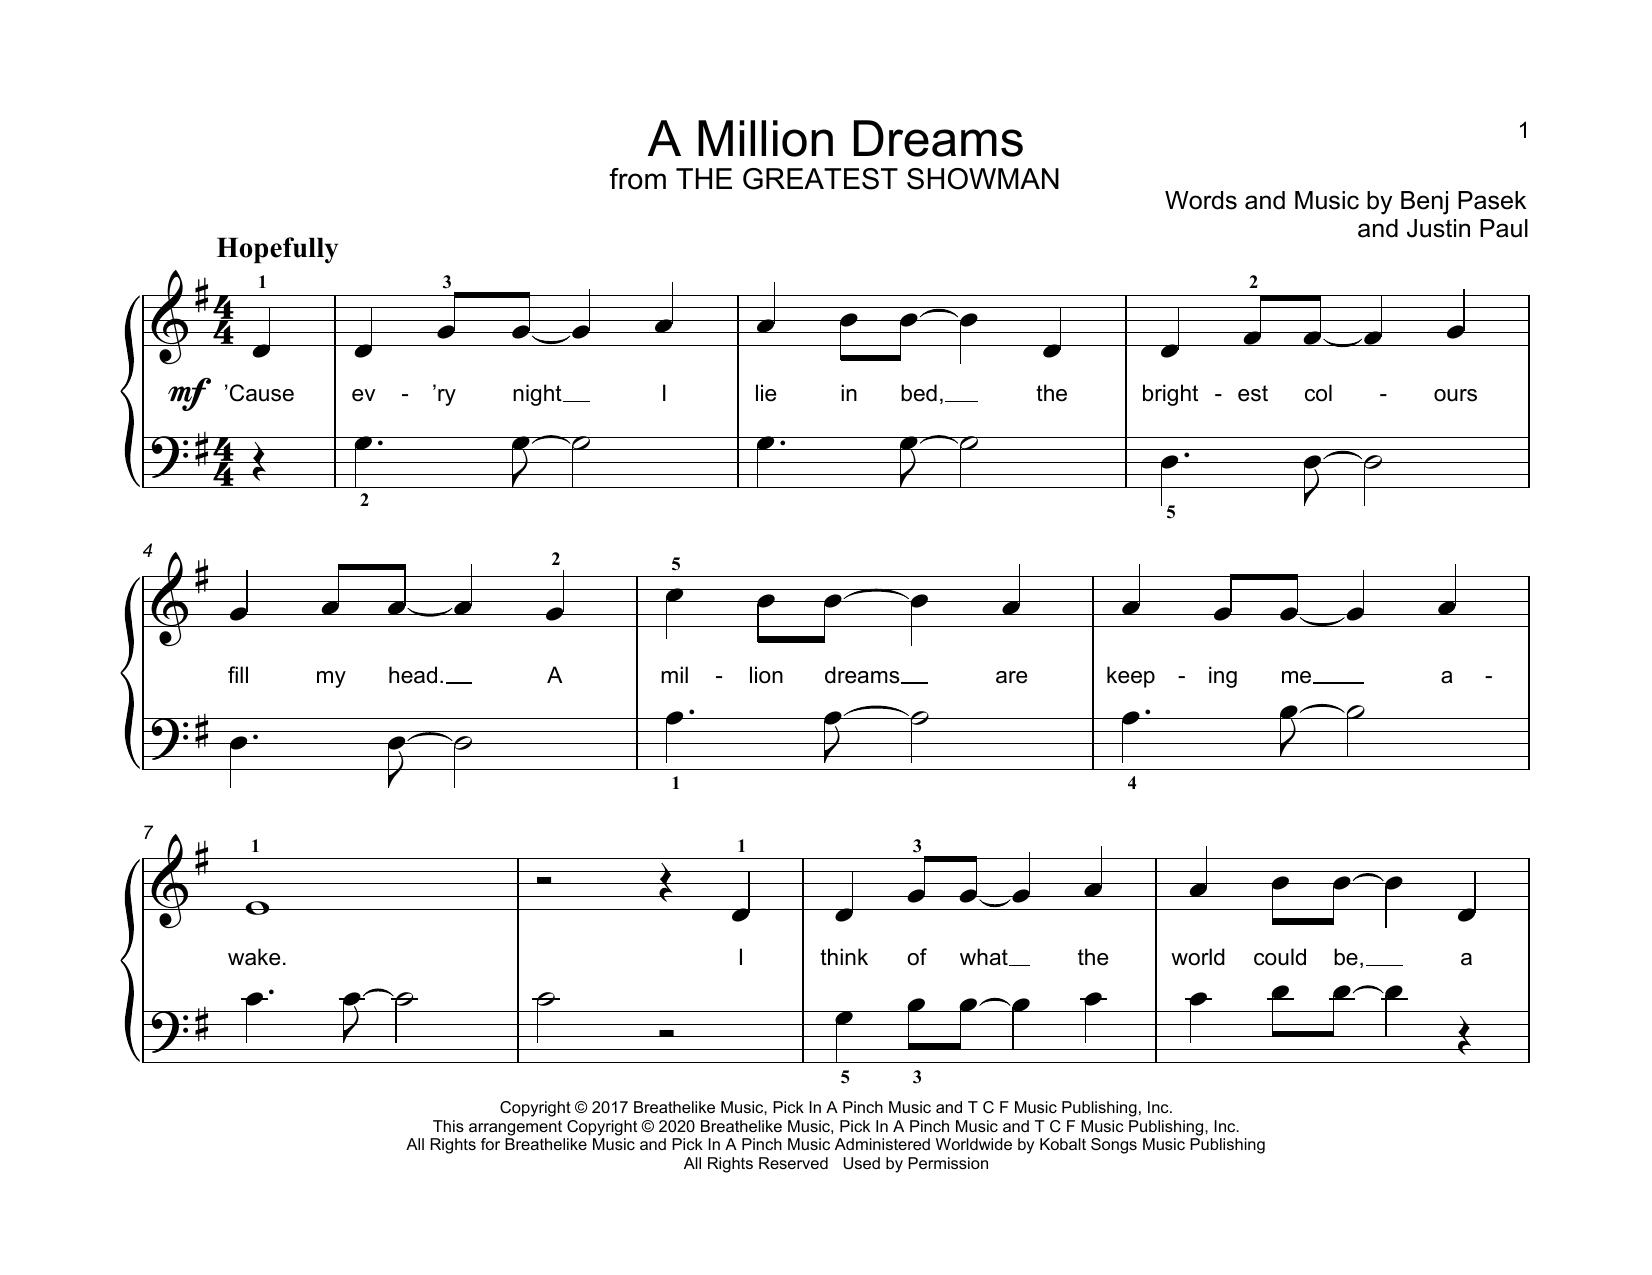 Pasek Paul A Million Dreams From The Greatest Showman Sheet Music Download Pdf Score 198164